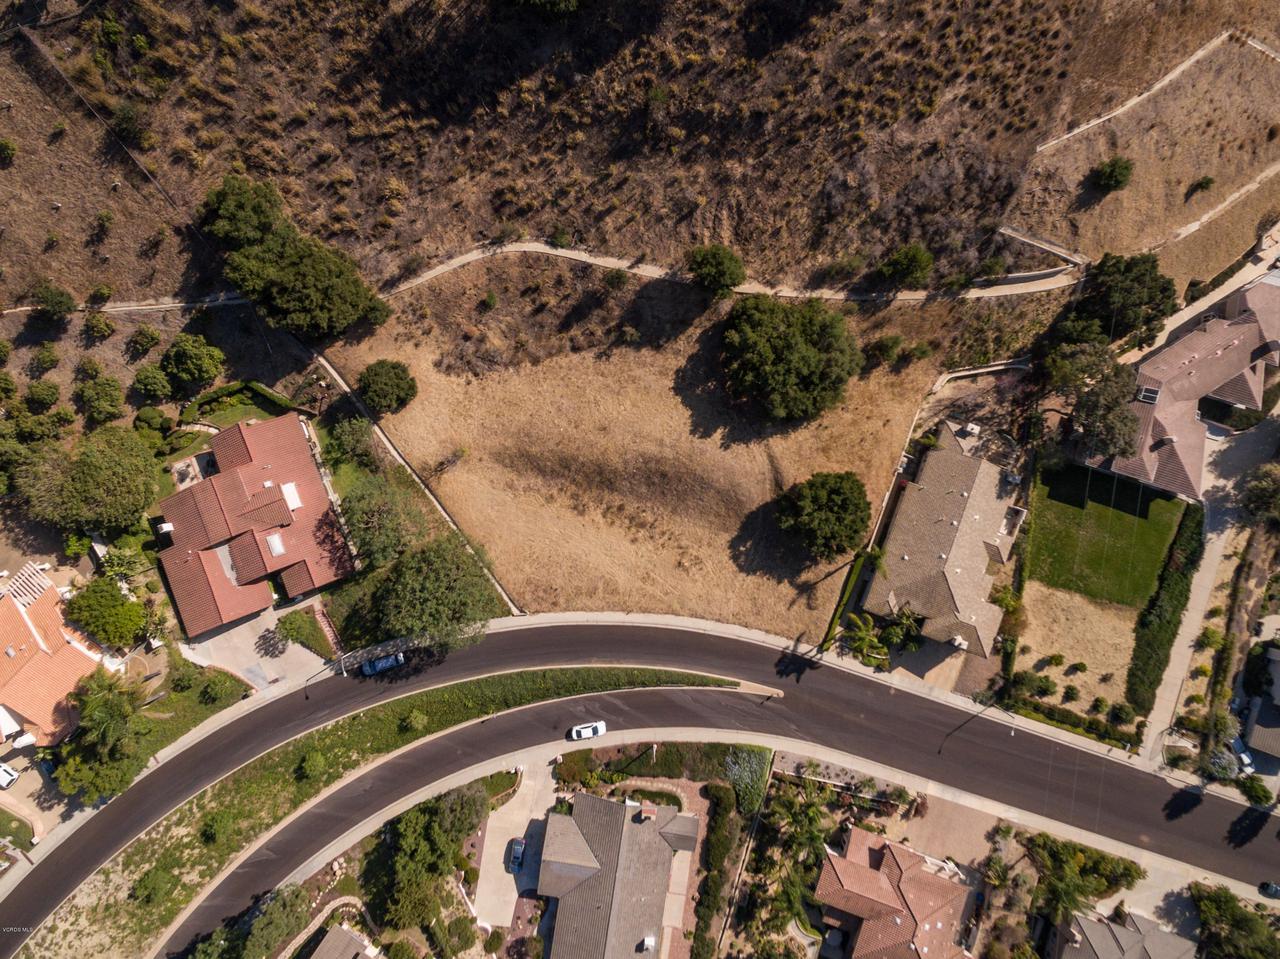 BRIDGEVIEW, Ventura, CA 93003 - lots aerial